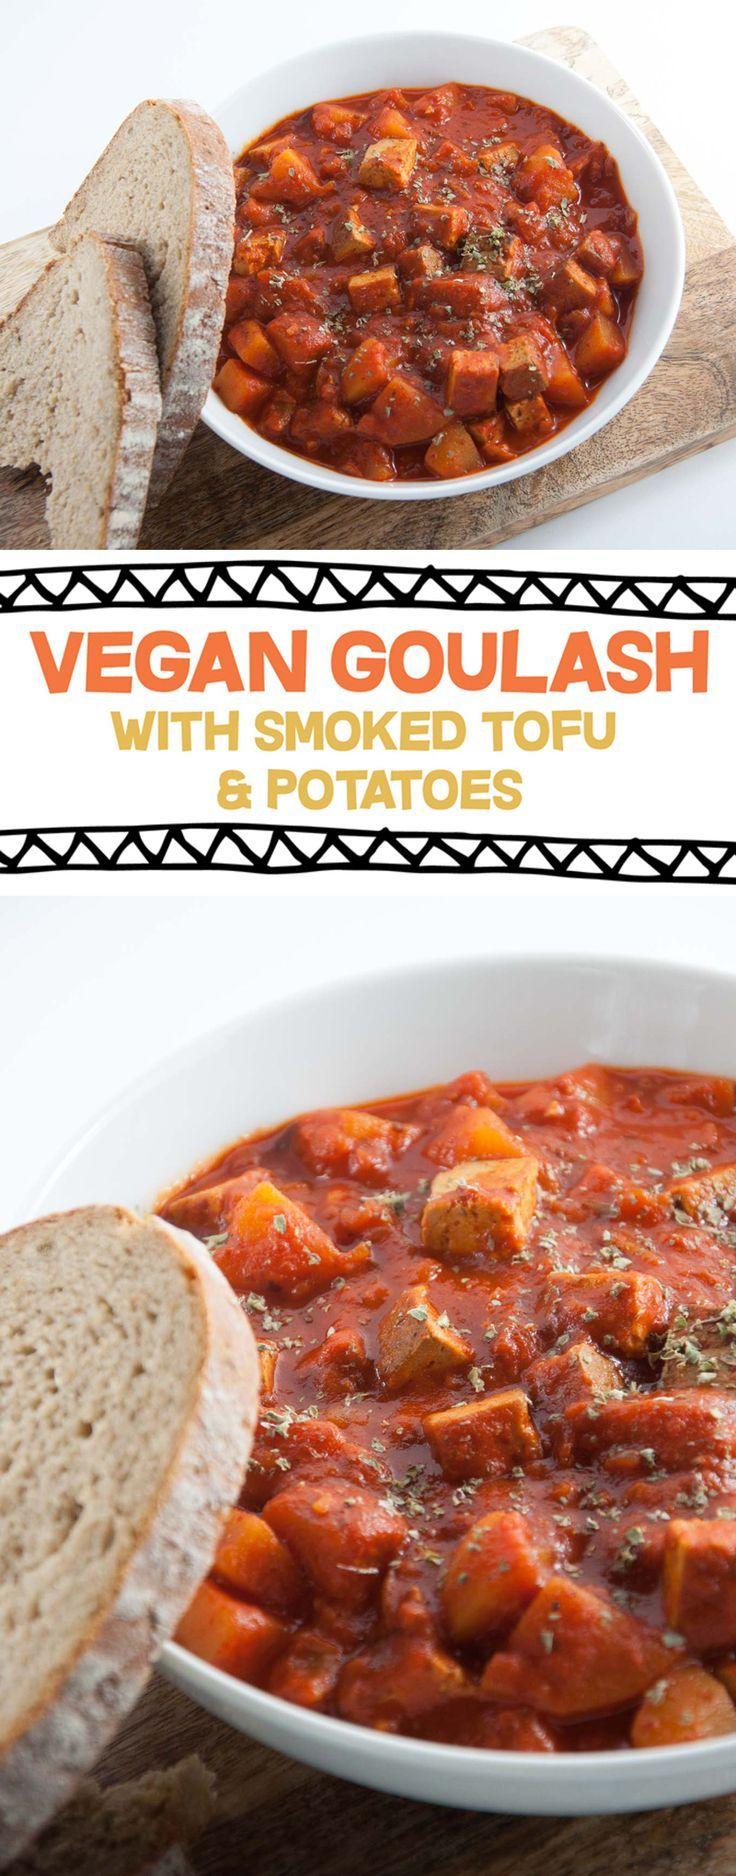 Vegan Goulash with Smoked Tofu and Potatoes ElephantasticVegan.com